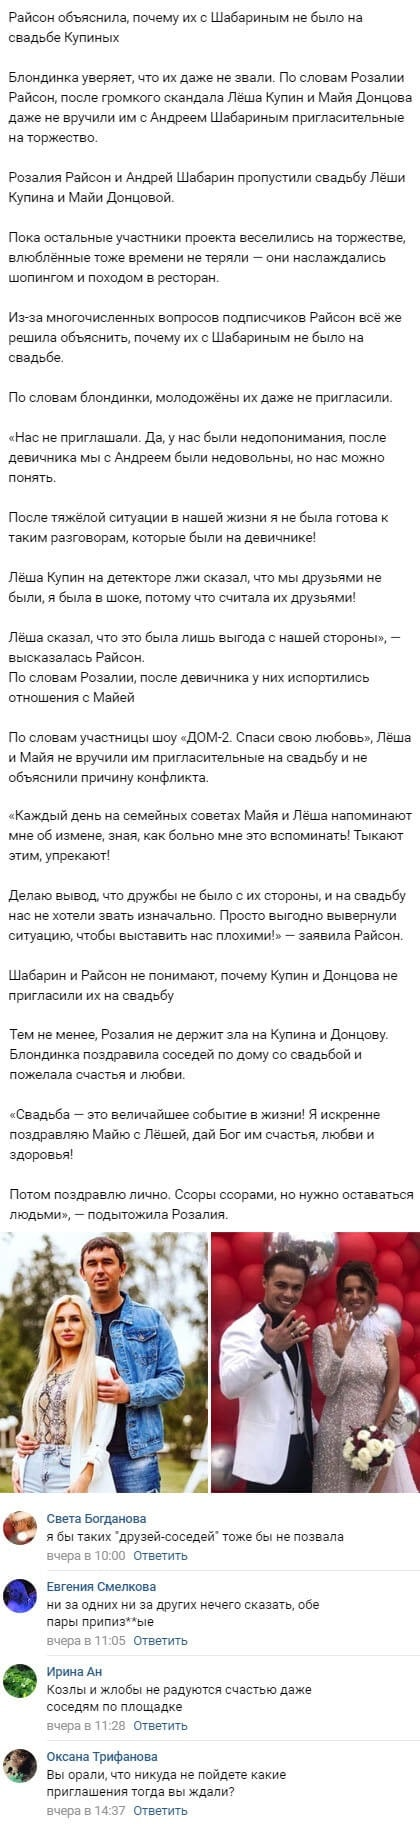 Розалия Райсон не пришла на свадьбу Майи Донцовой